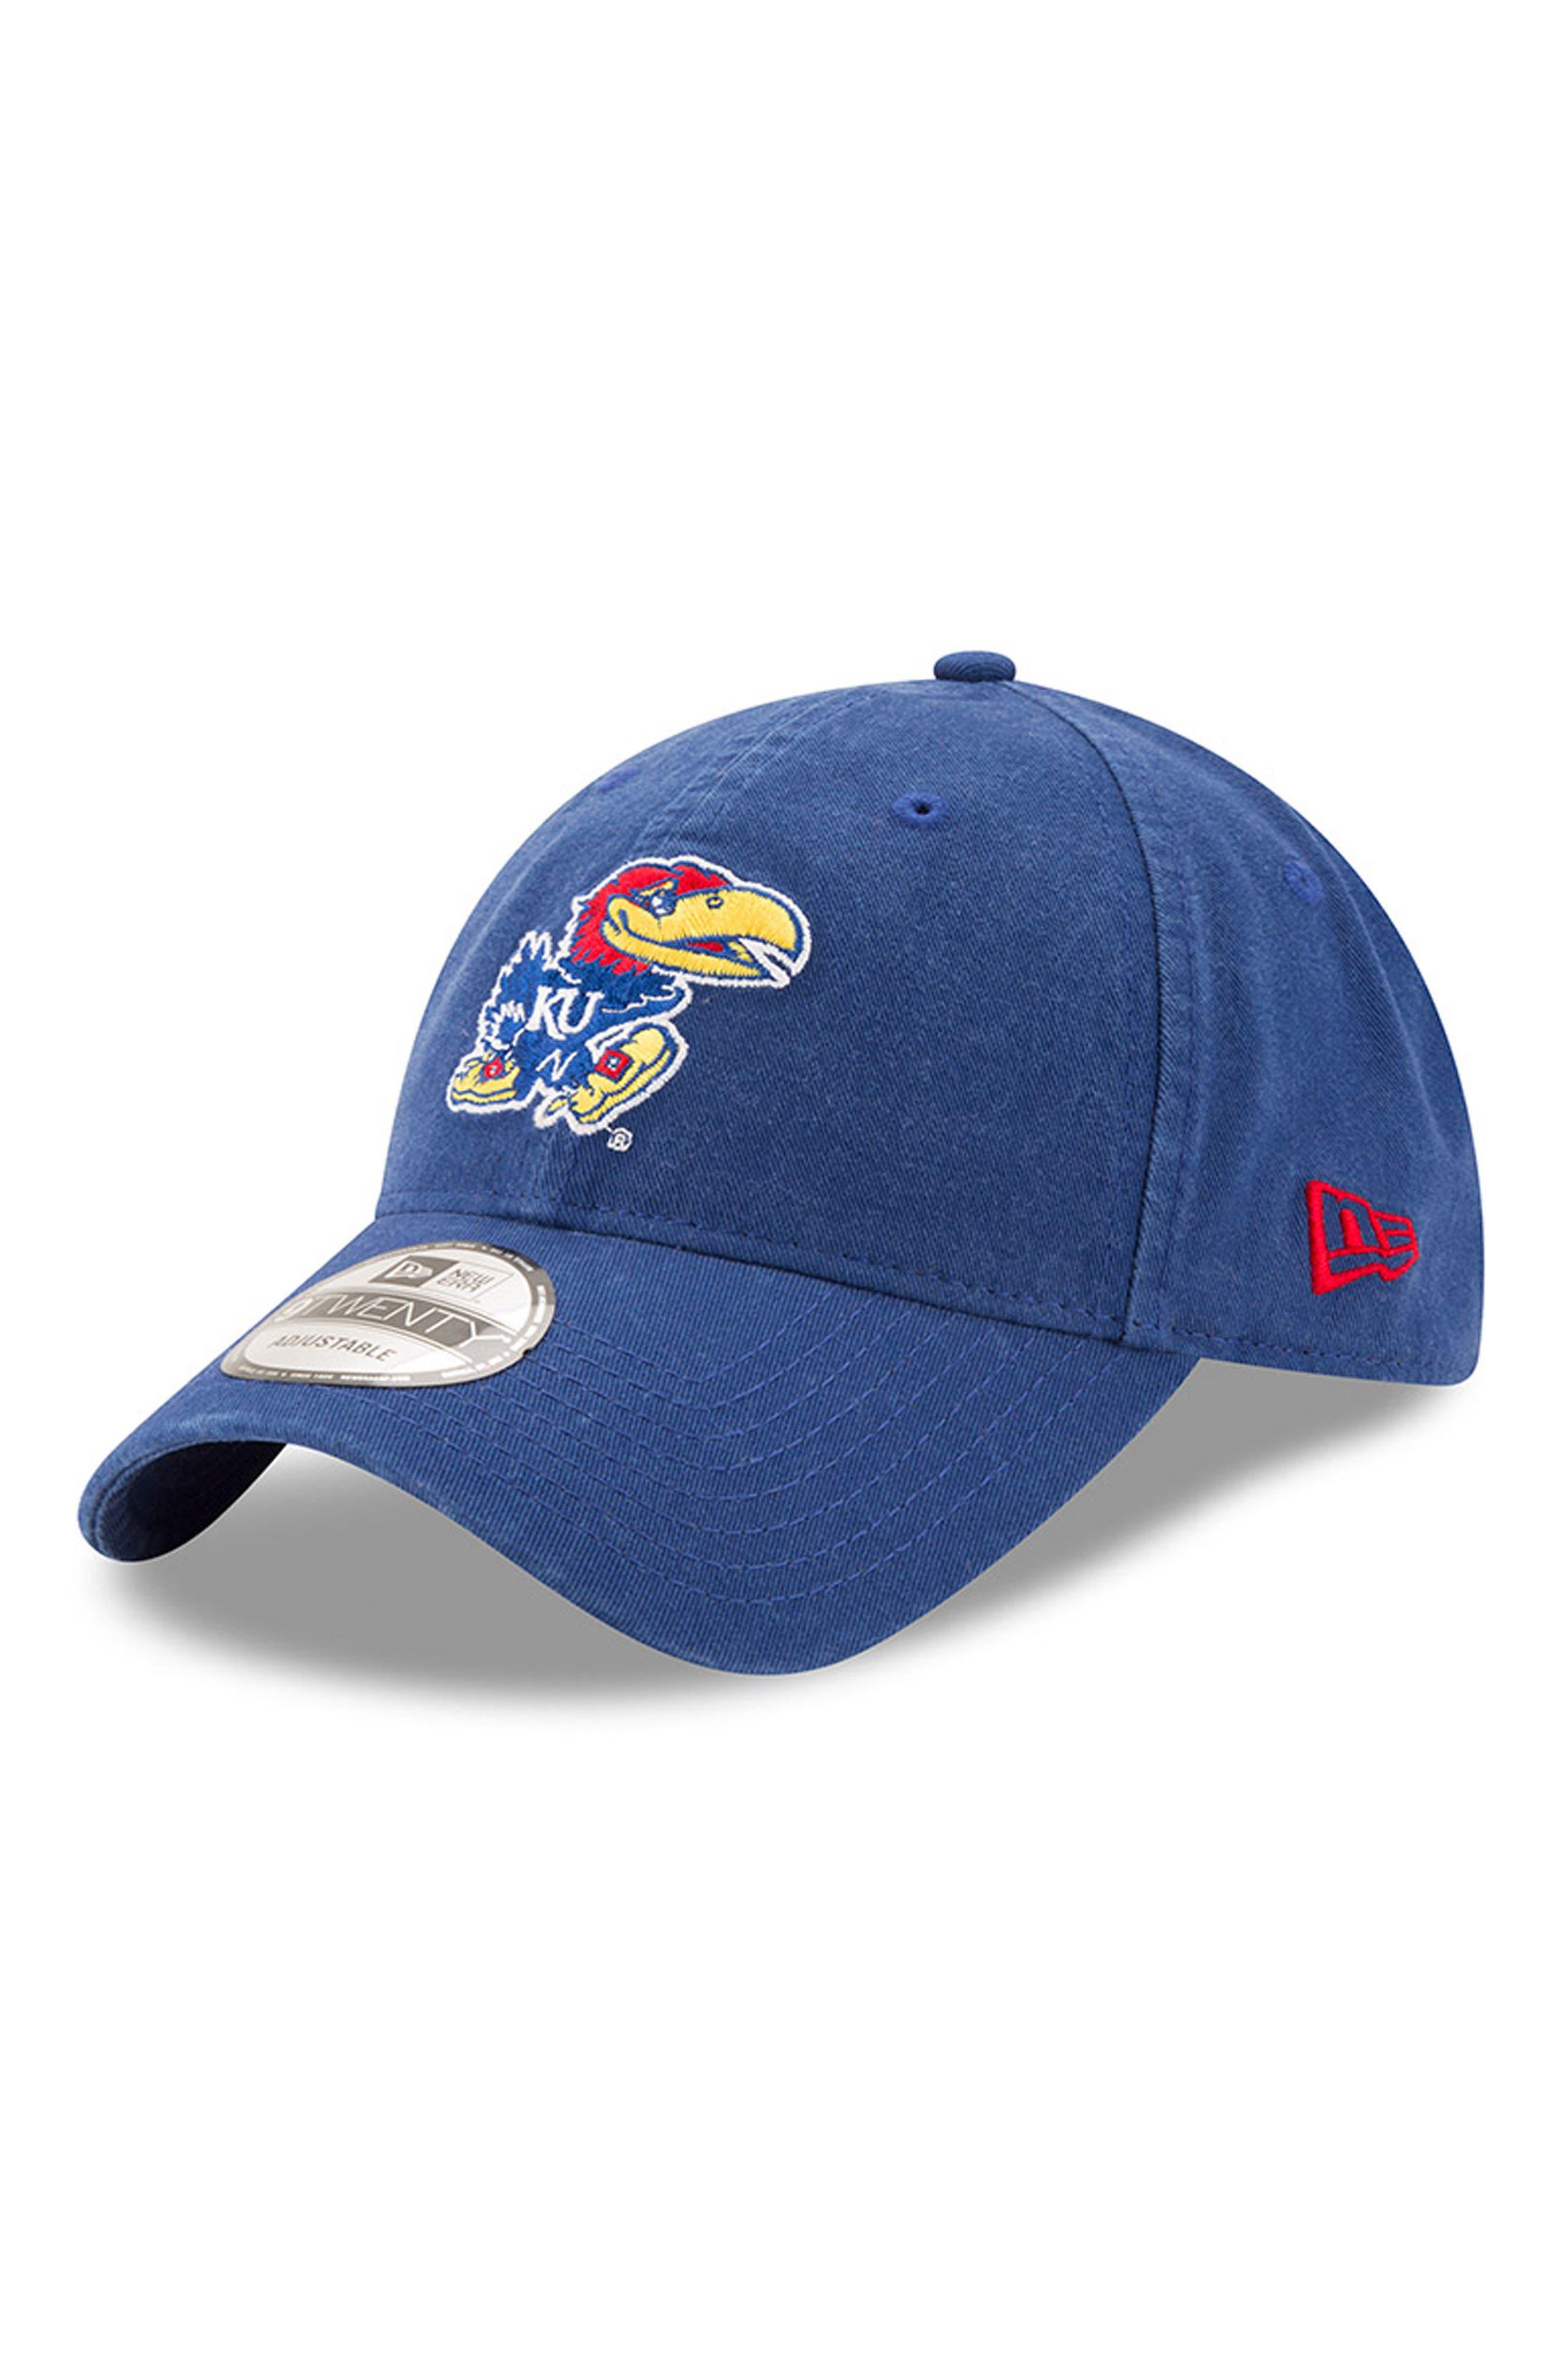 Main Image - New Era Collegiate Core Classic - Kansas Jayhawks Baseball Cap